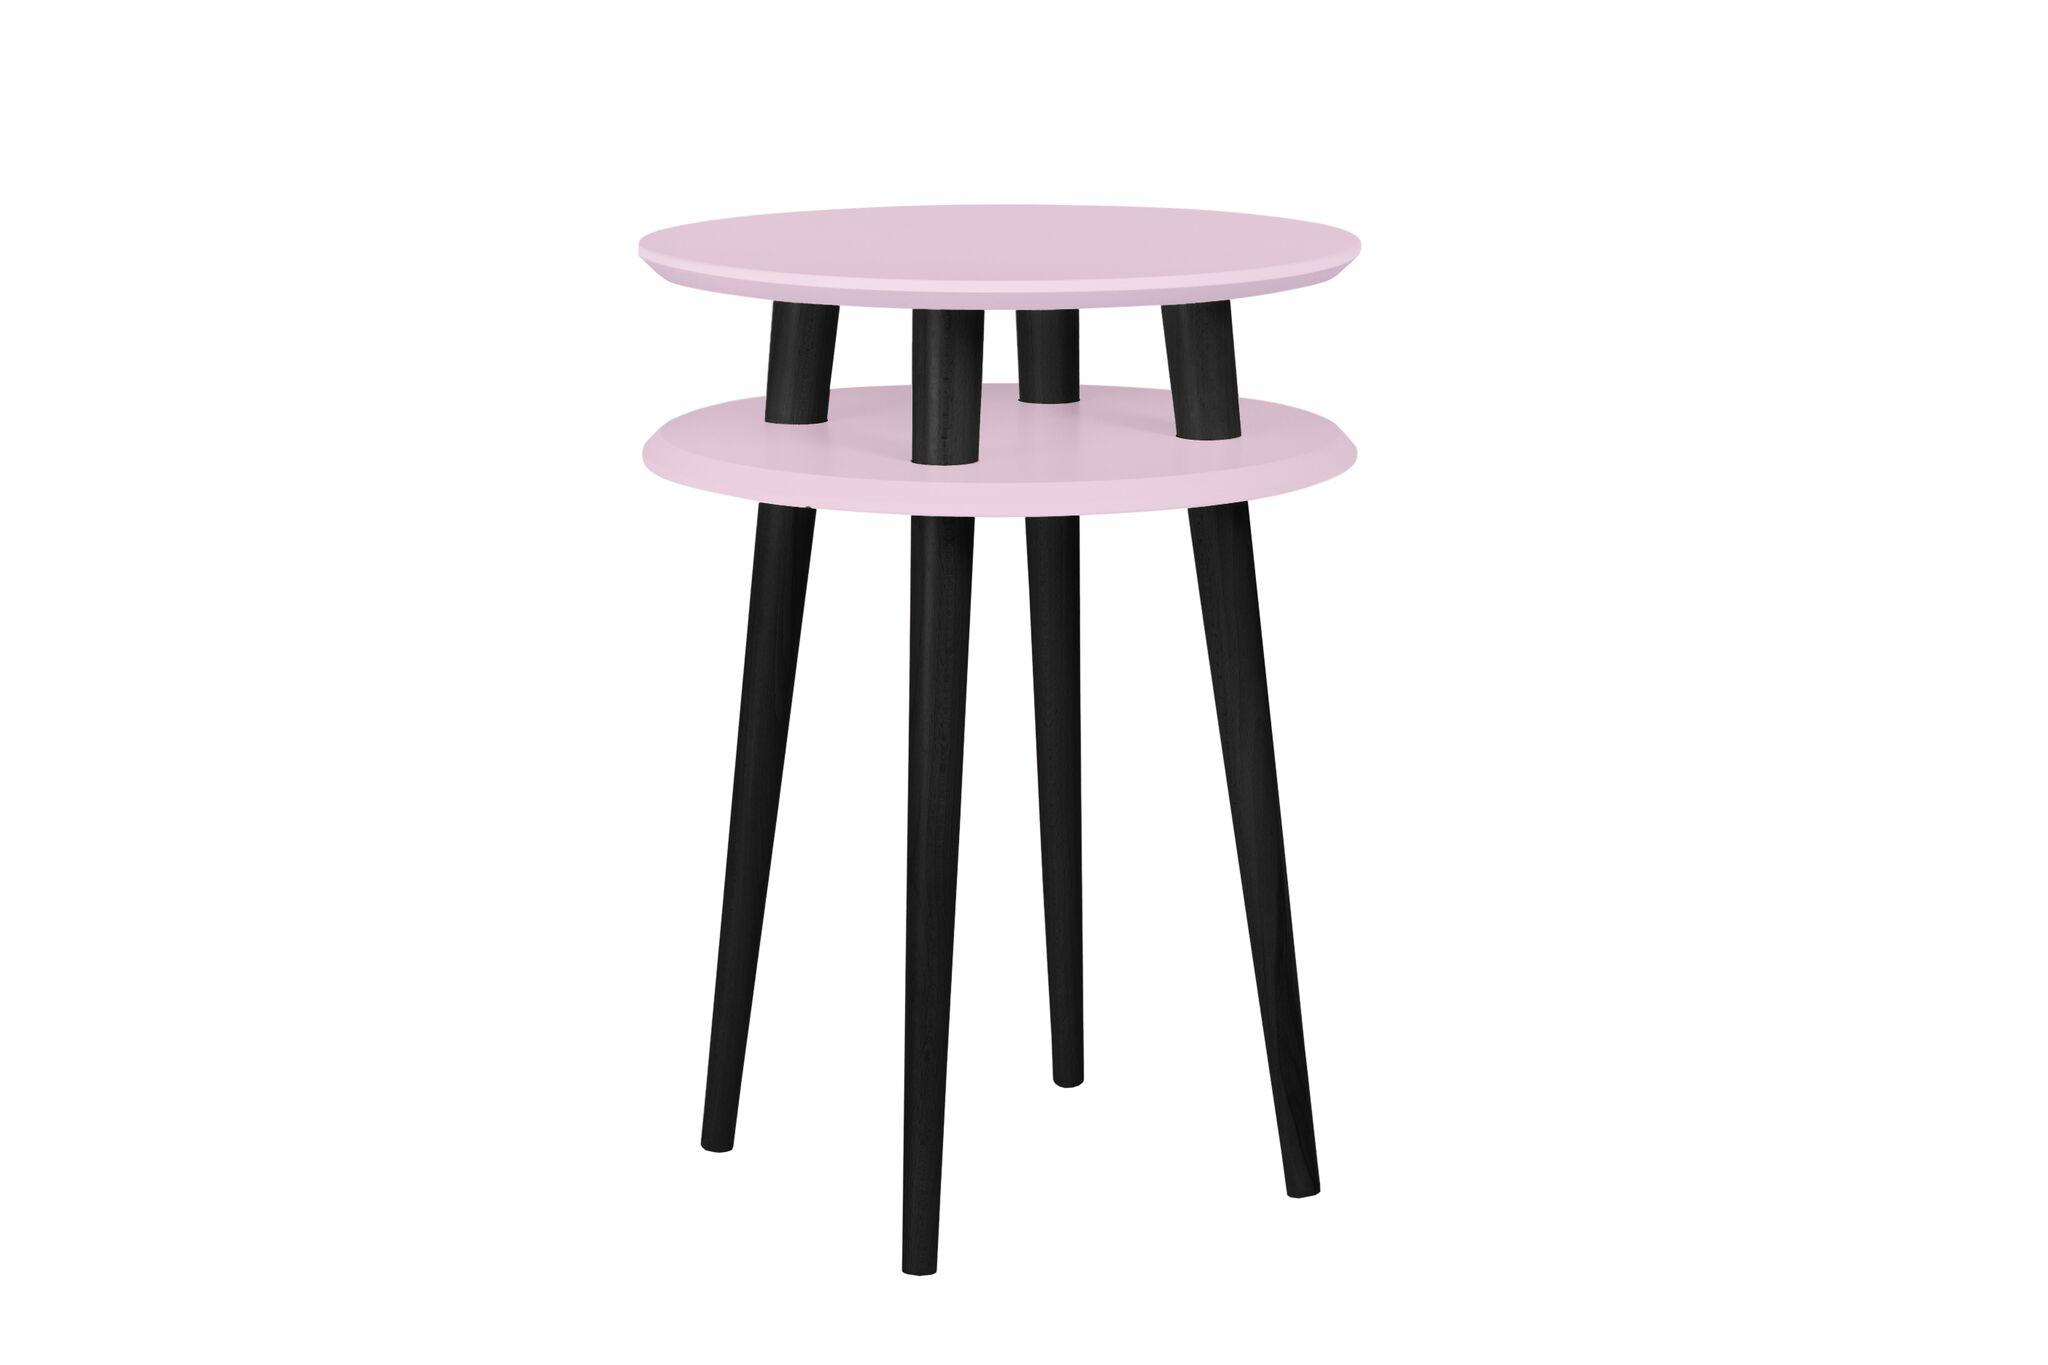 Masa de cafea Ufo High Dusky Pink / Black O45xh61 cm